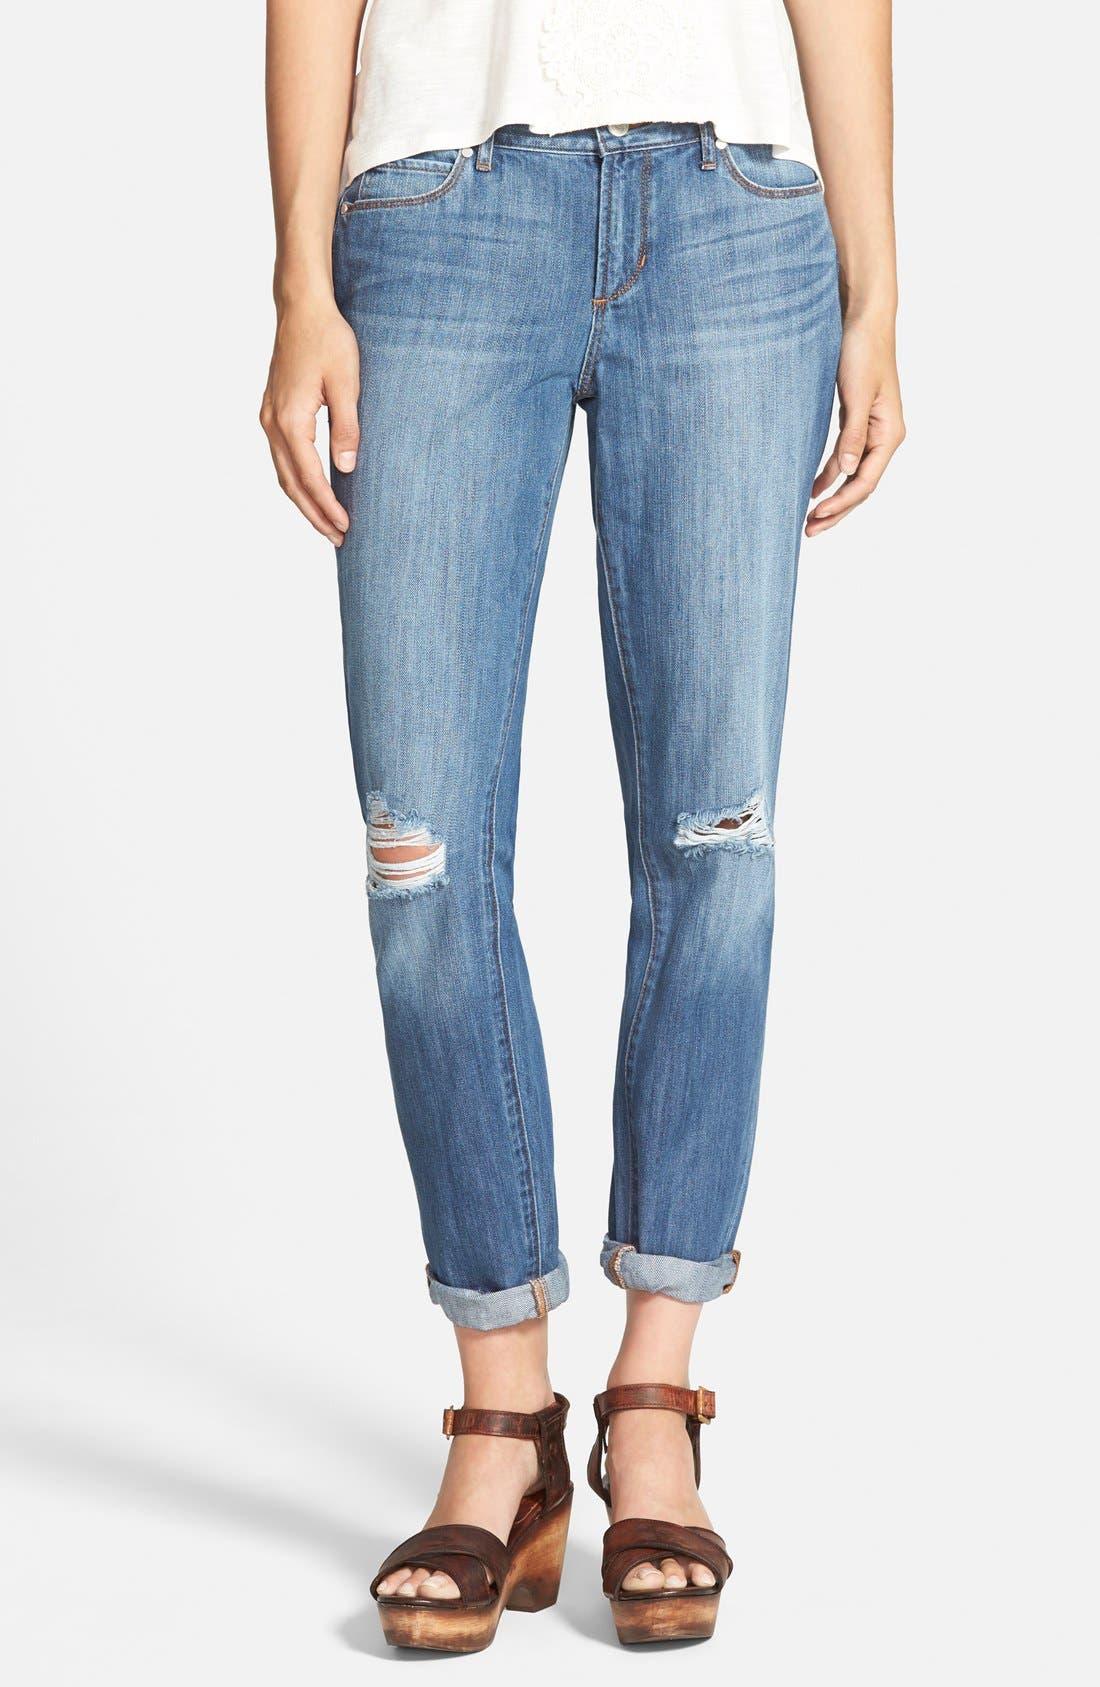 Main Image - Articles of Society 'Cindy' Boyfriend Jeans (Medium Wash)